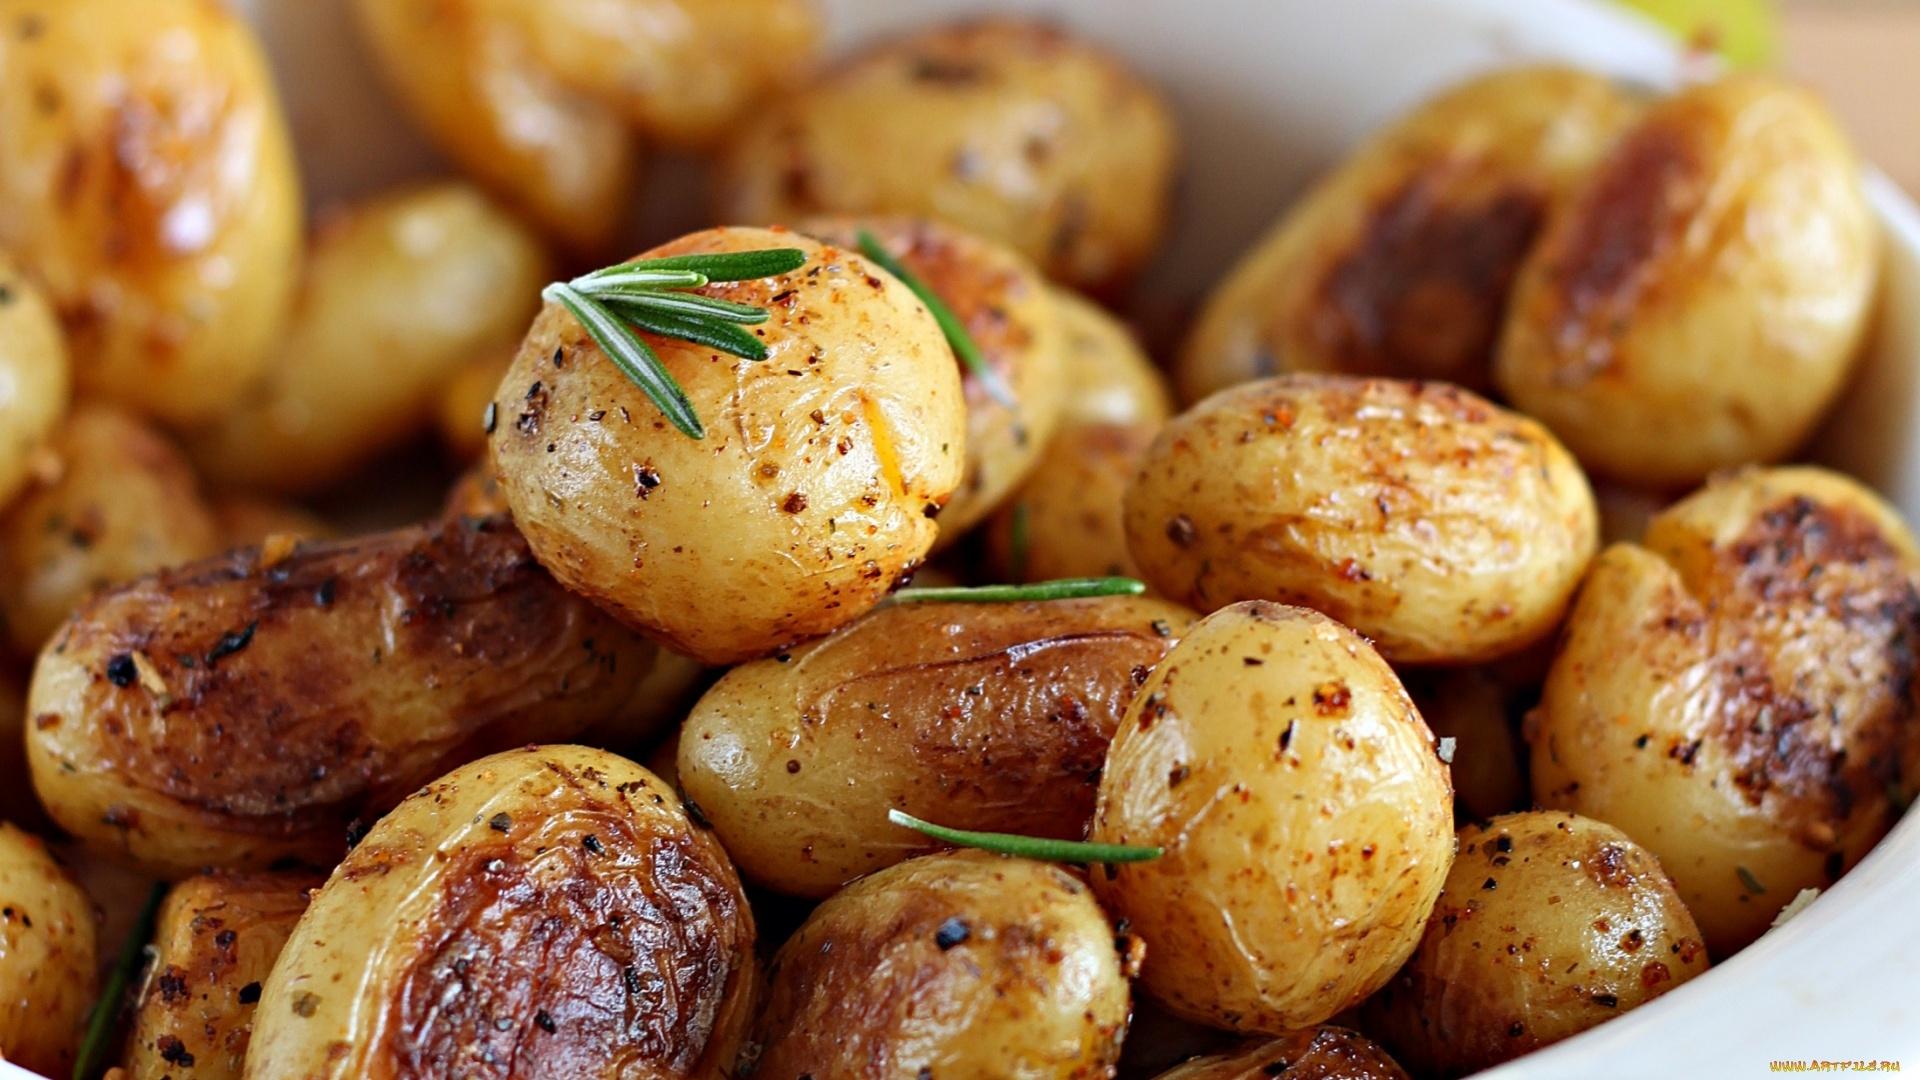 Potatoes Full HD Wallpaper